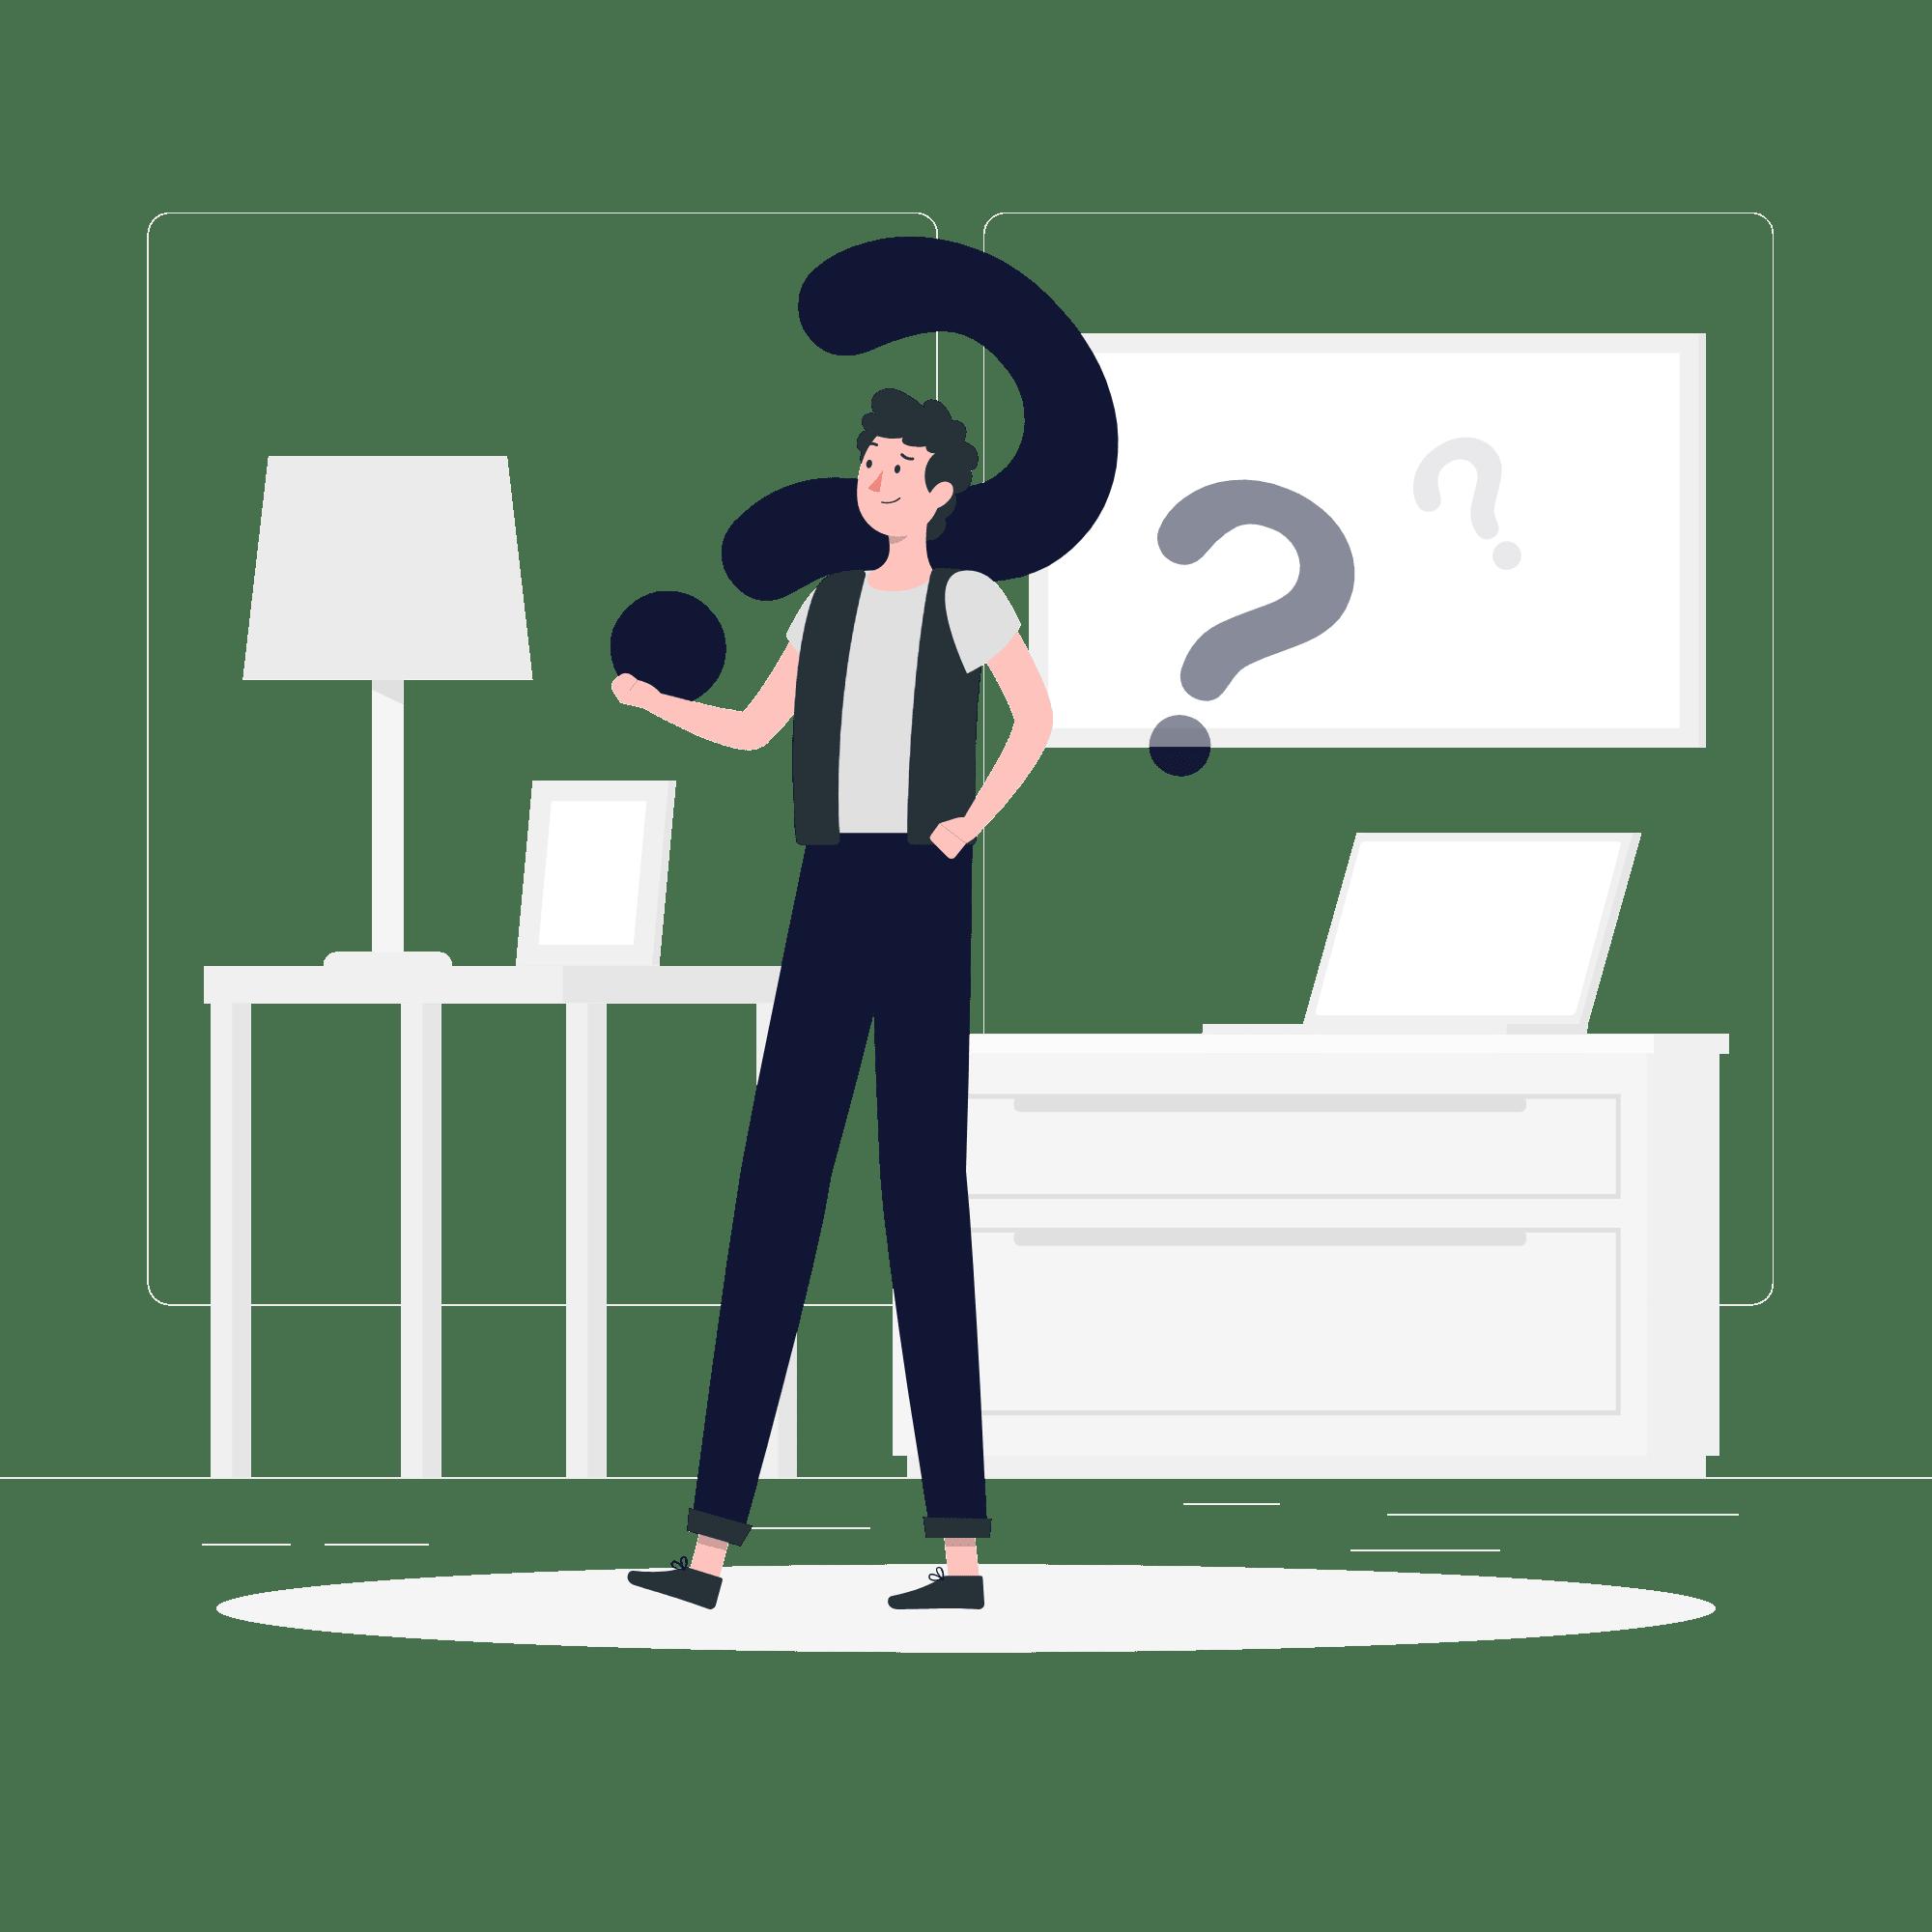 سوالات پر تکرار طراحی سایت